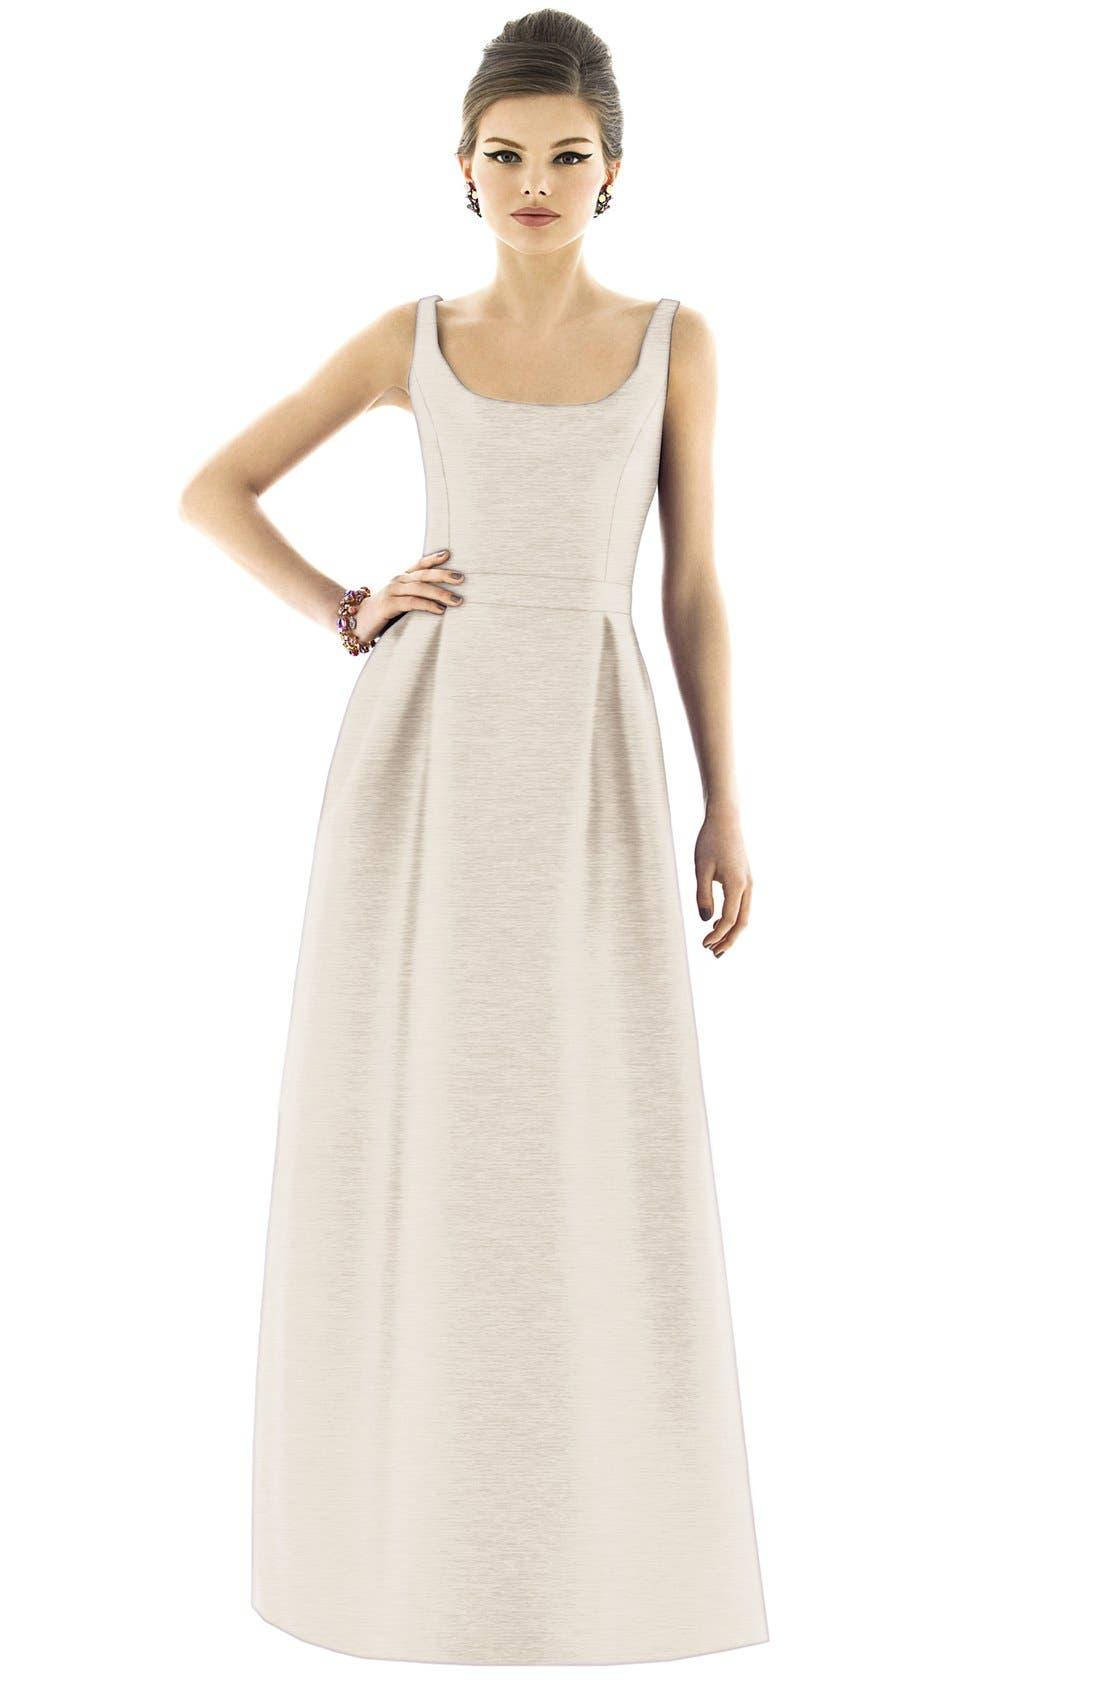 Main Image - Alfred Sung Scoop Neck Dupioni Full Length Dress